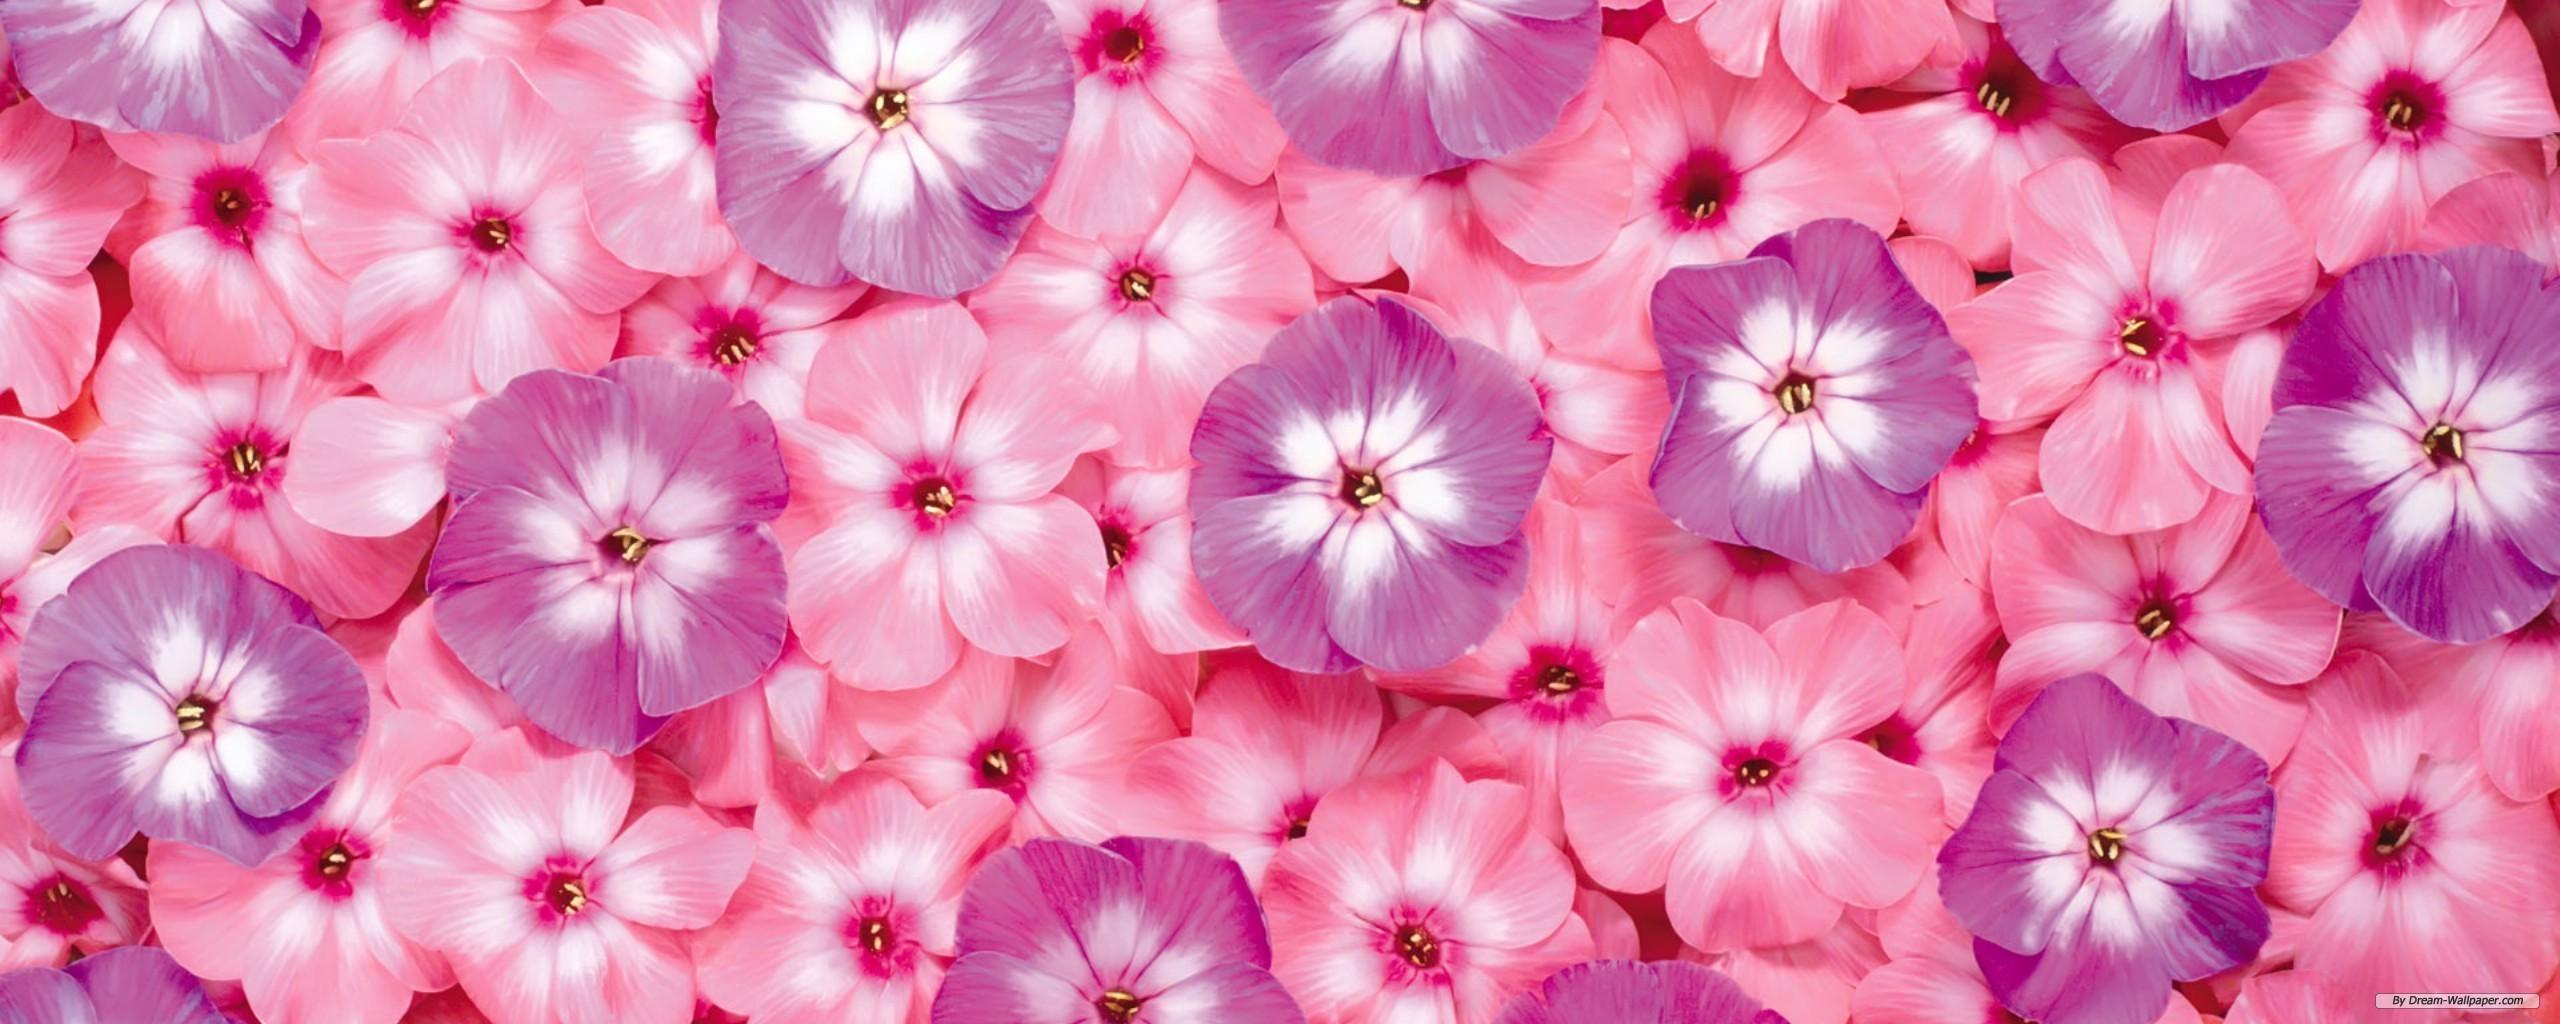 Pin Flower Wallpaper Dual Screen 2560x1024